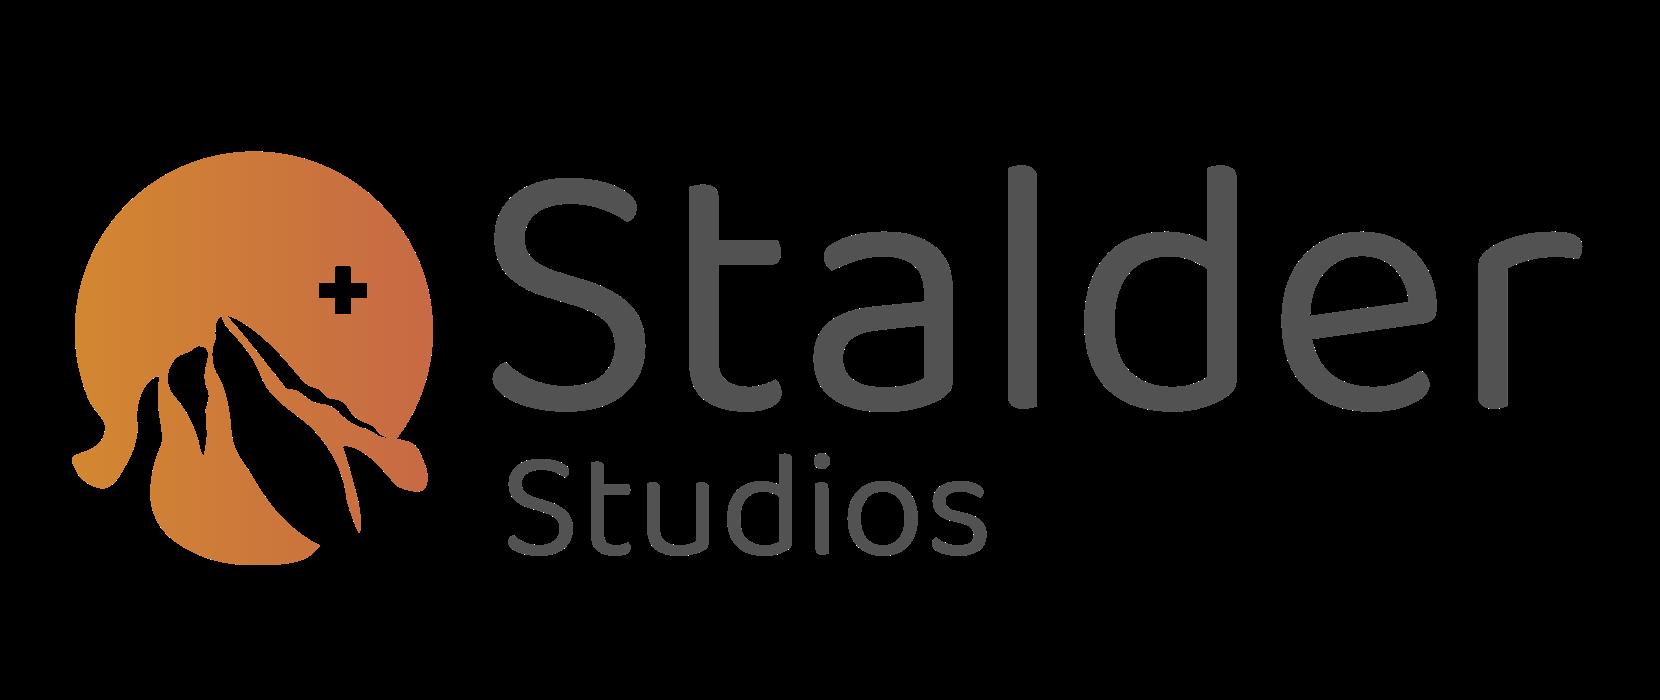 Stalder Studios GmbH